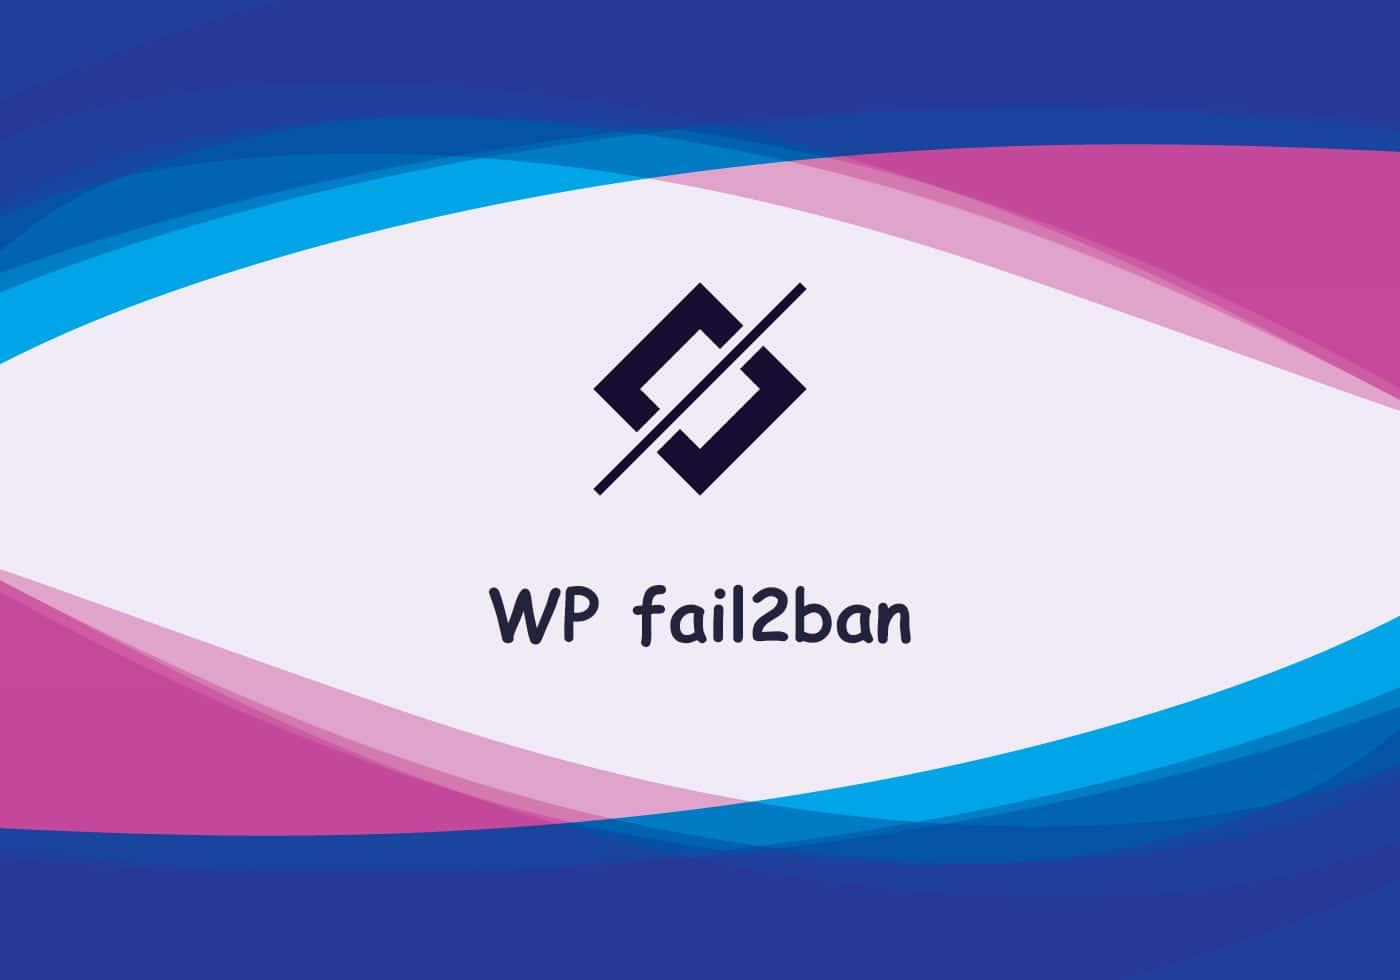 wp fail2ban